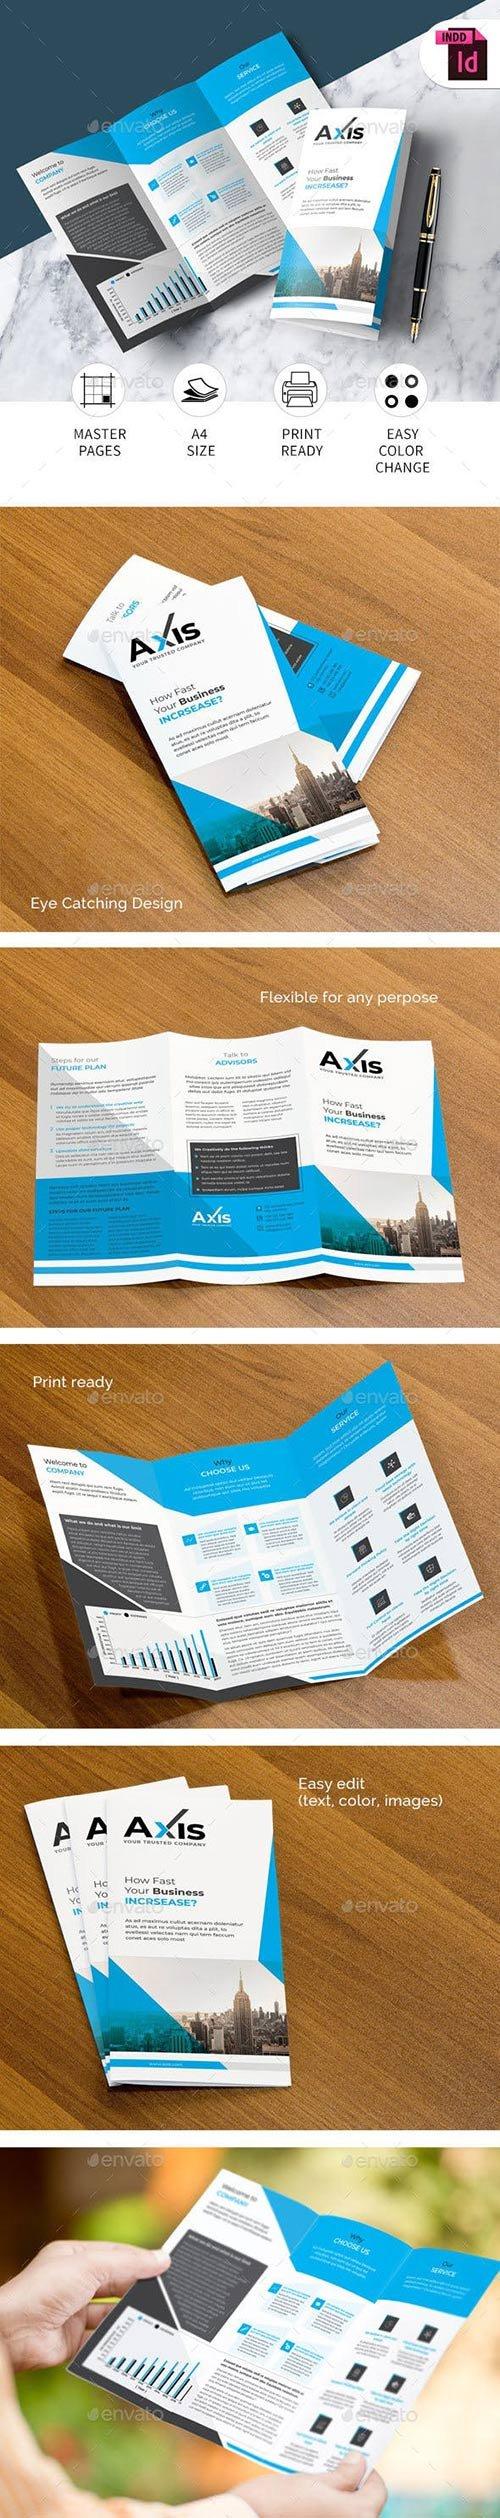 Graphicriver - Trifold Brochure 22101276